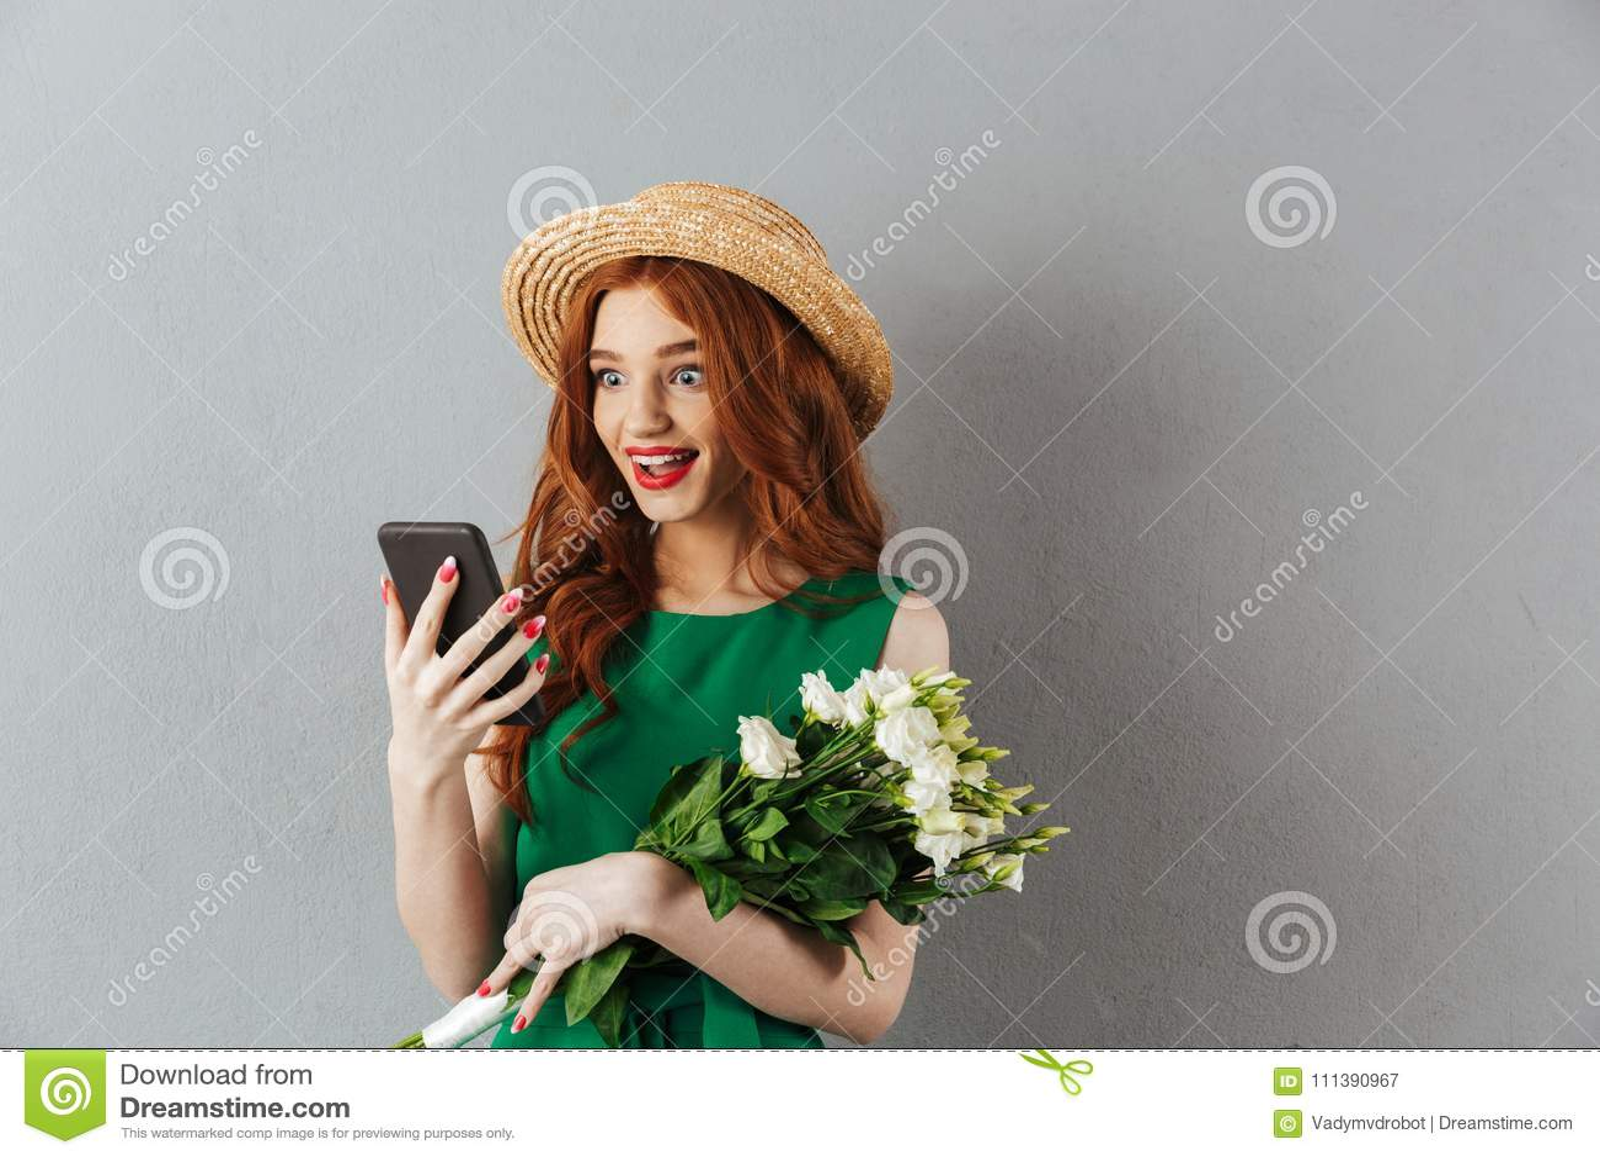 Redhead in flower hat